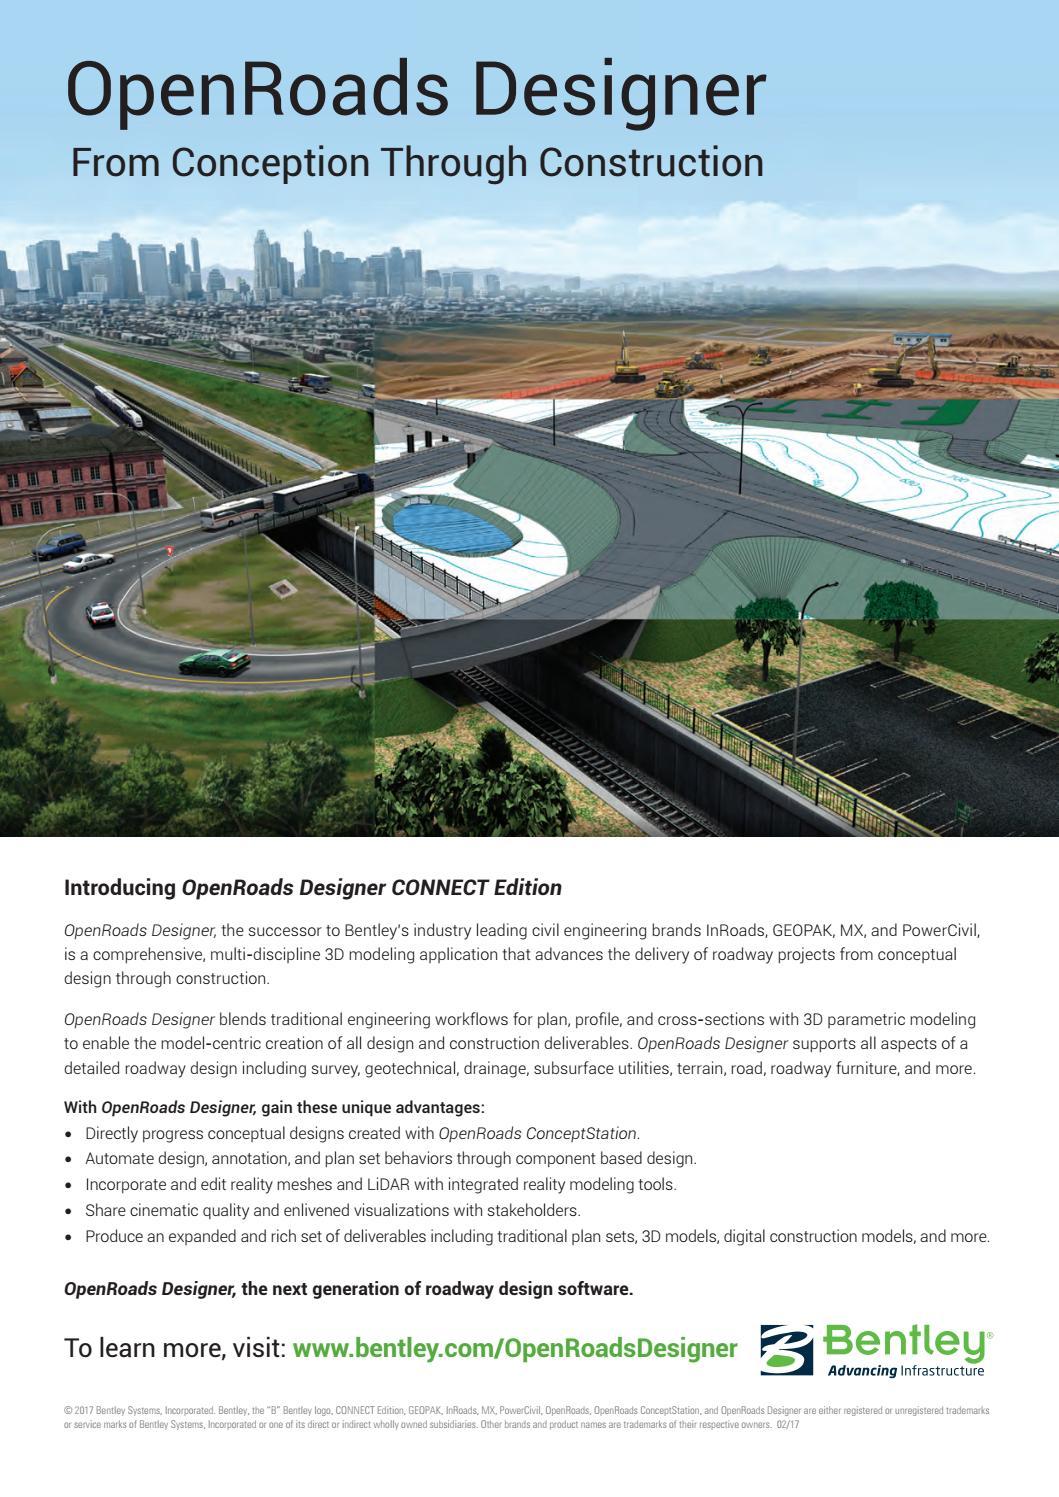 Samferdsel Infrastruktur 01 Utgave By Value Publishing Issuu